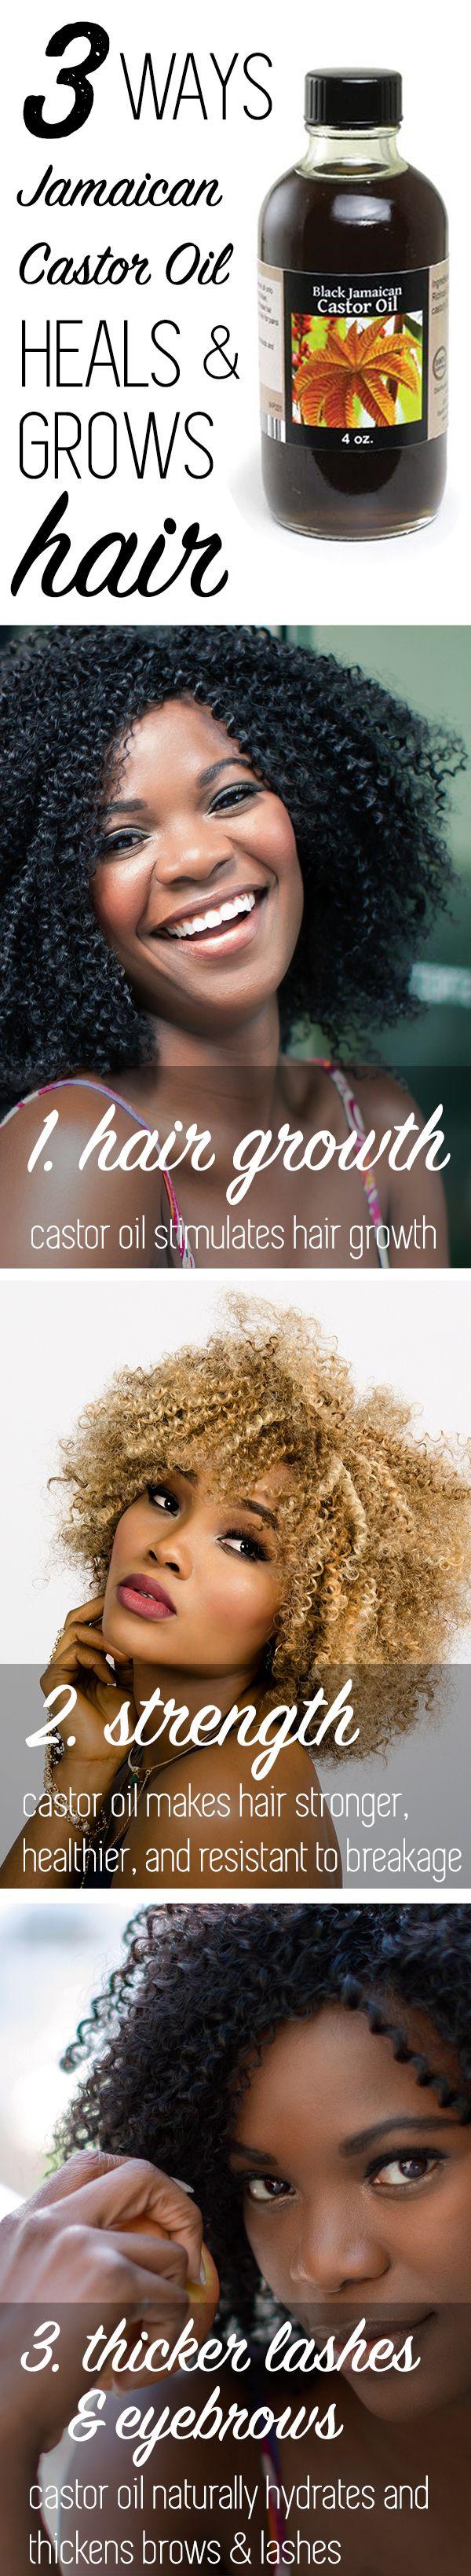 Black Jamaican Castor Oil (Organic) 4 oz   Jamaican castor oil